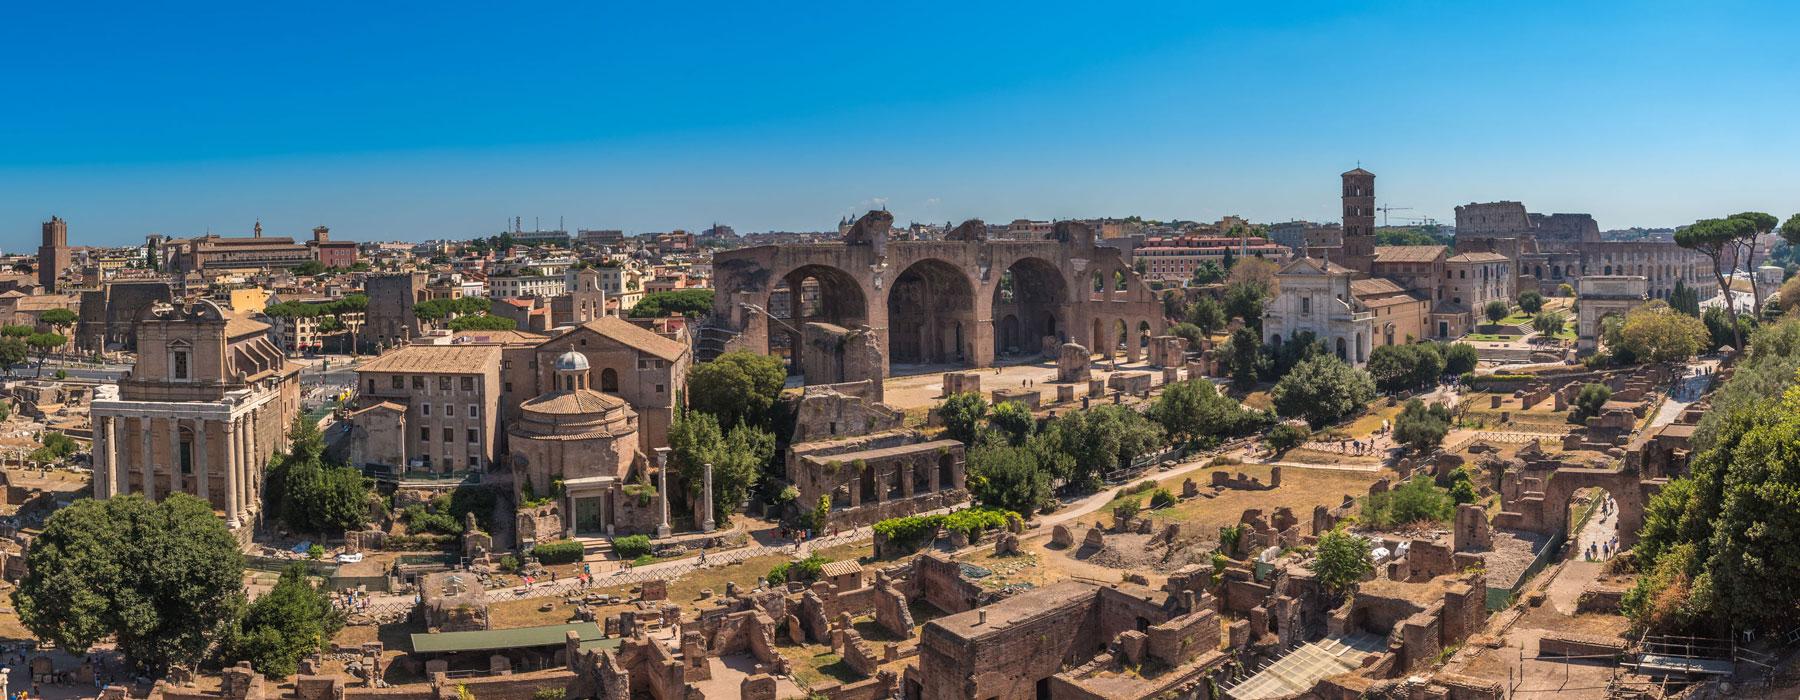 Roma_4.jpg